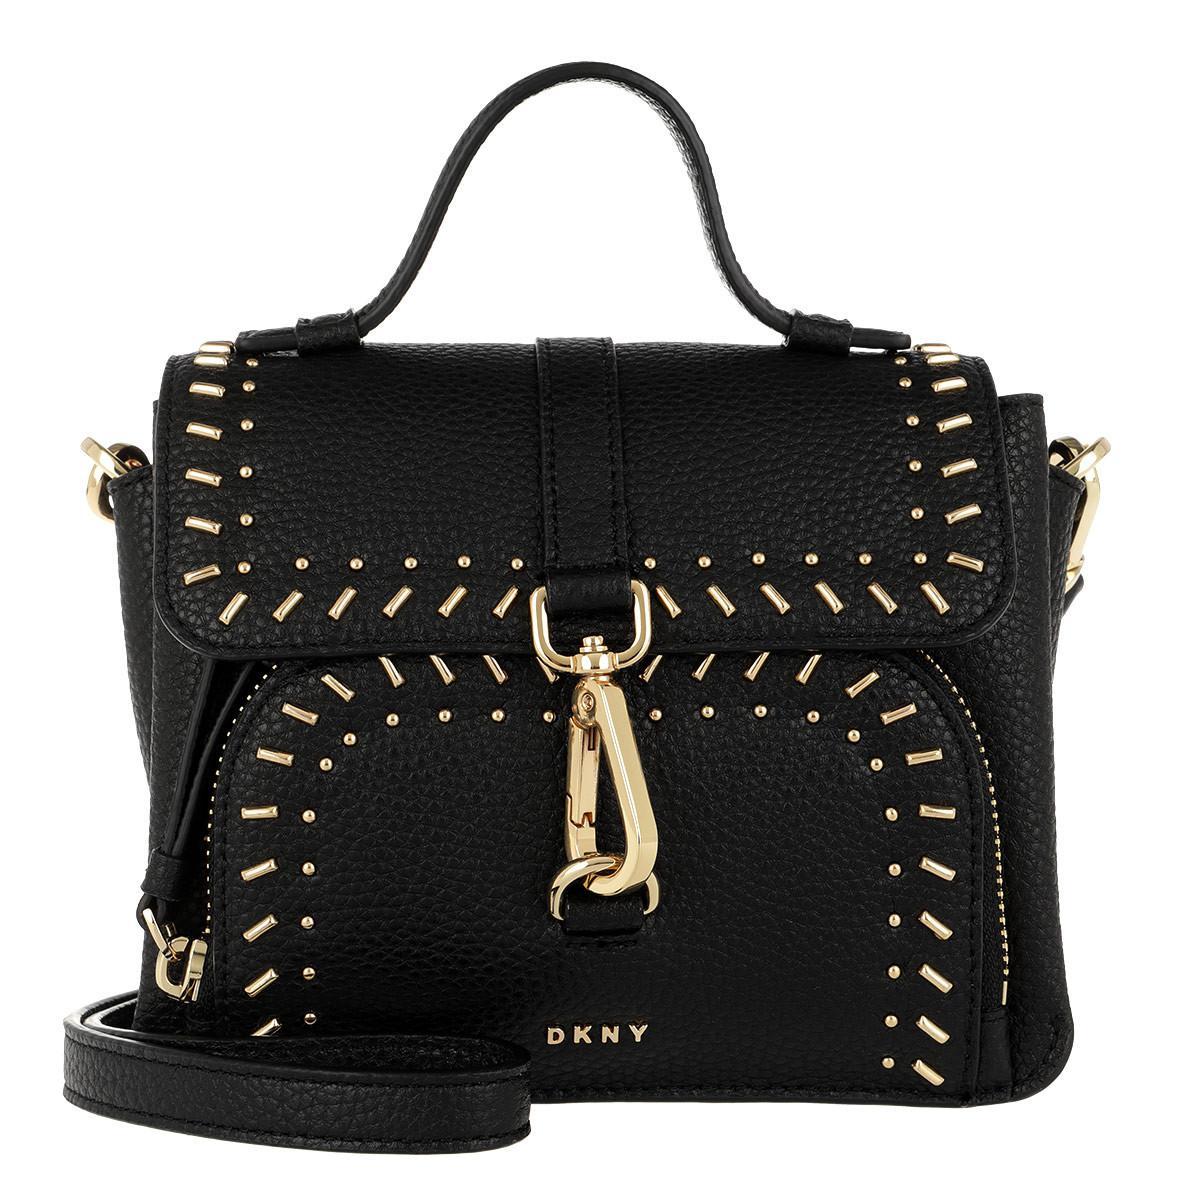 Cross Body Bags - Paris SM Stud Crossbody Bag Black/Gold - black - Cross Body Bags for ladies DKNY m1ZPaeN